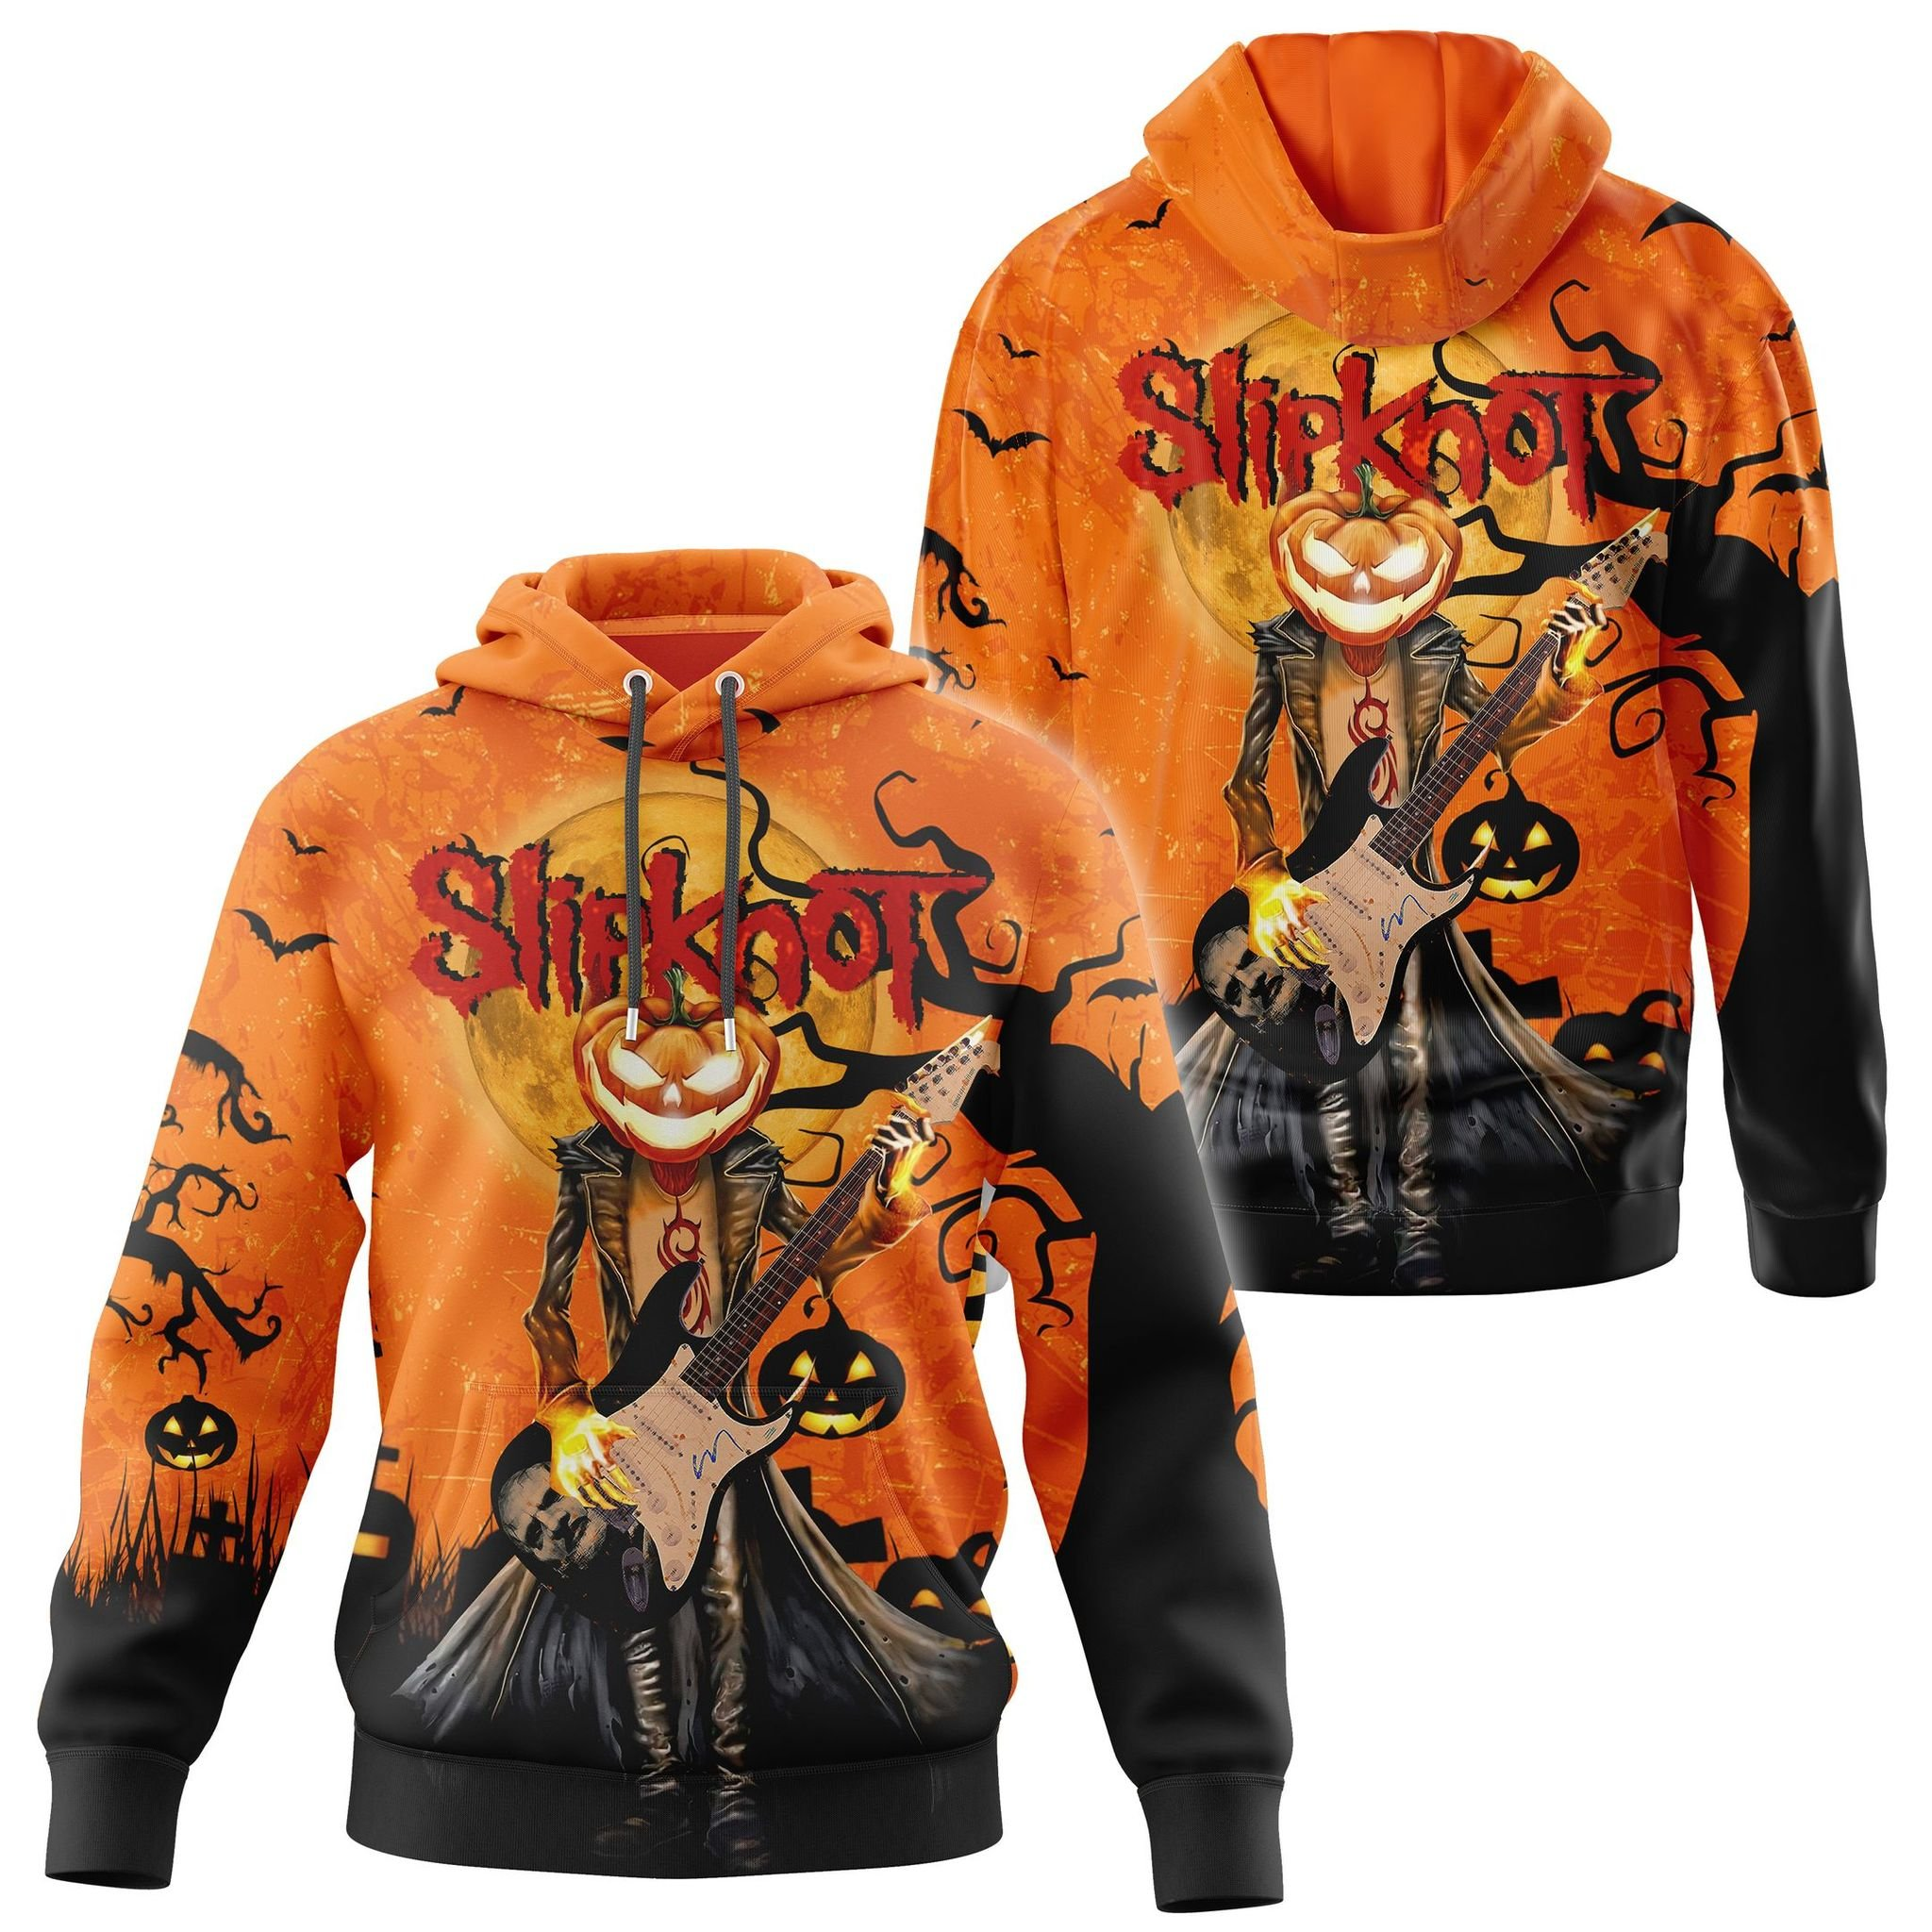 Slipknot Halloween 3d hoodie and shirt 2